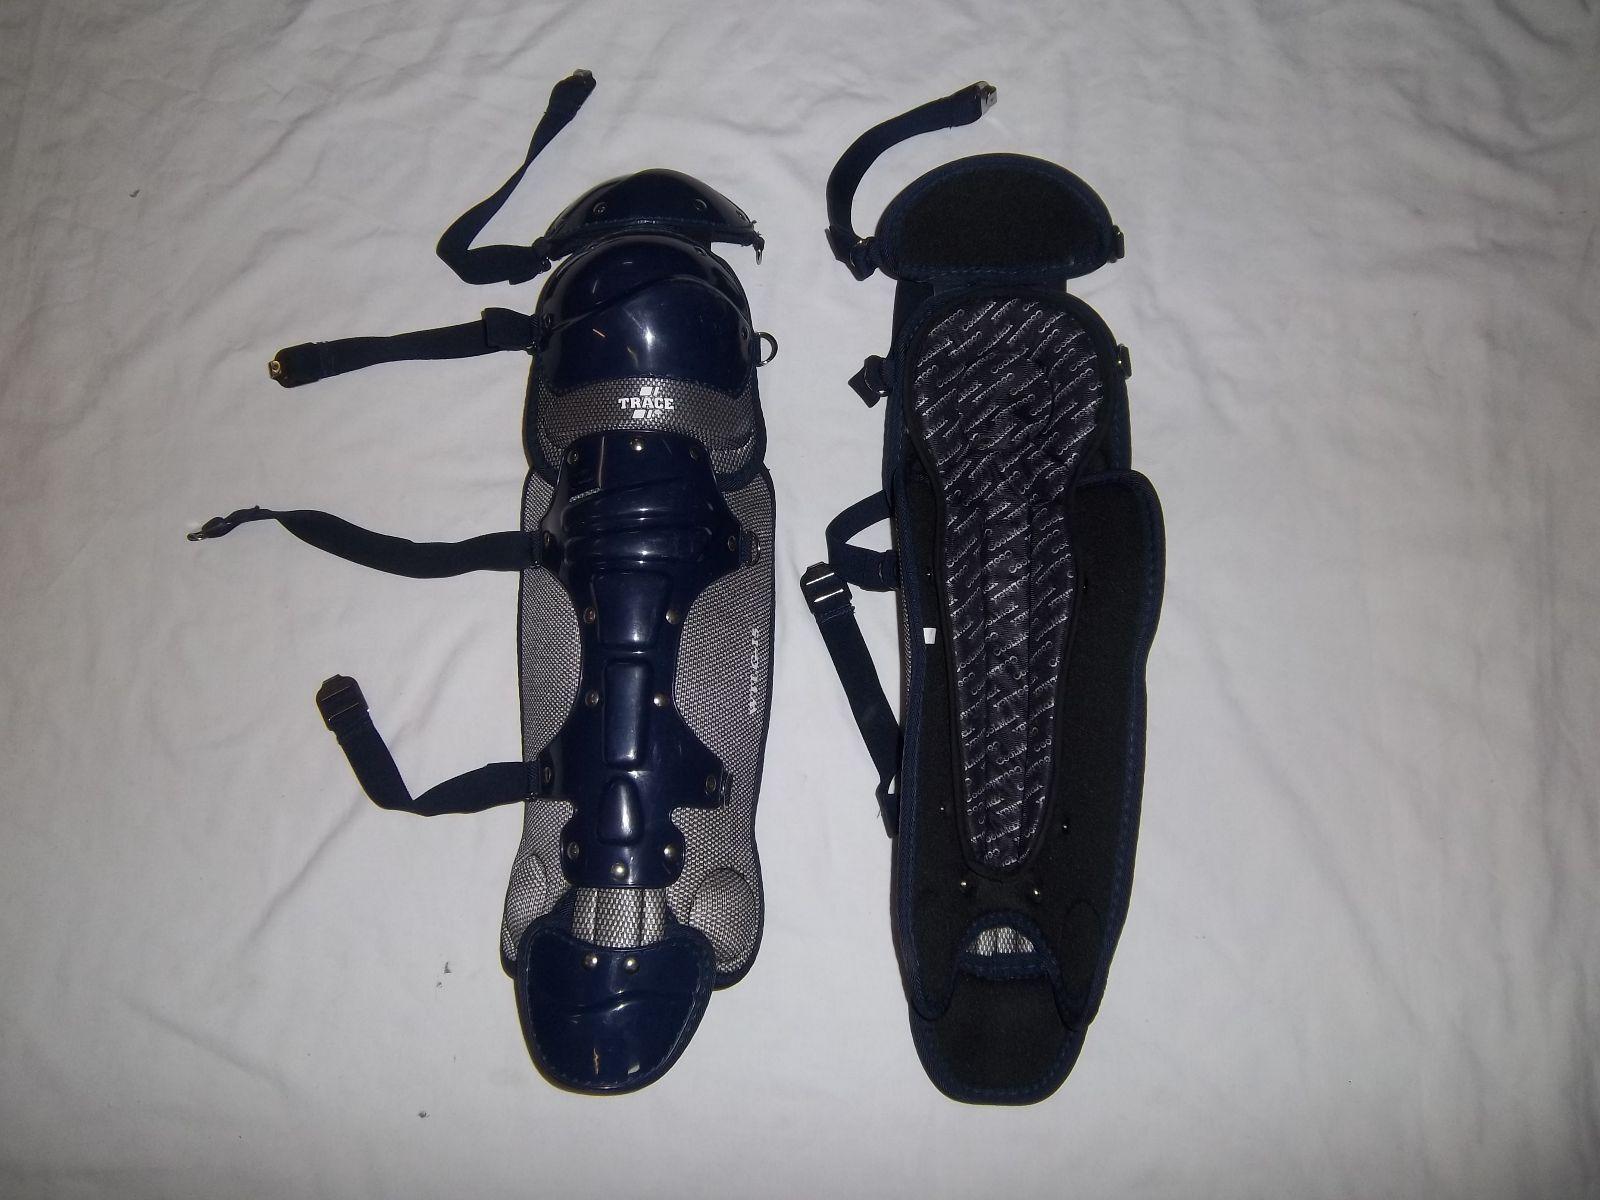 TRACE WTLG15 YOUTH ADULT  BASEBALL SOFTBALL LEG GUARD (VARIOUS COLORS)